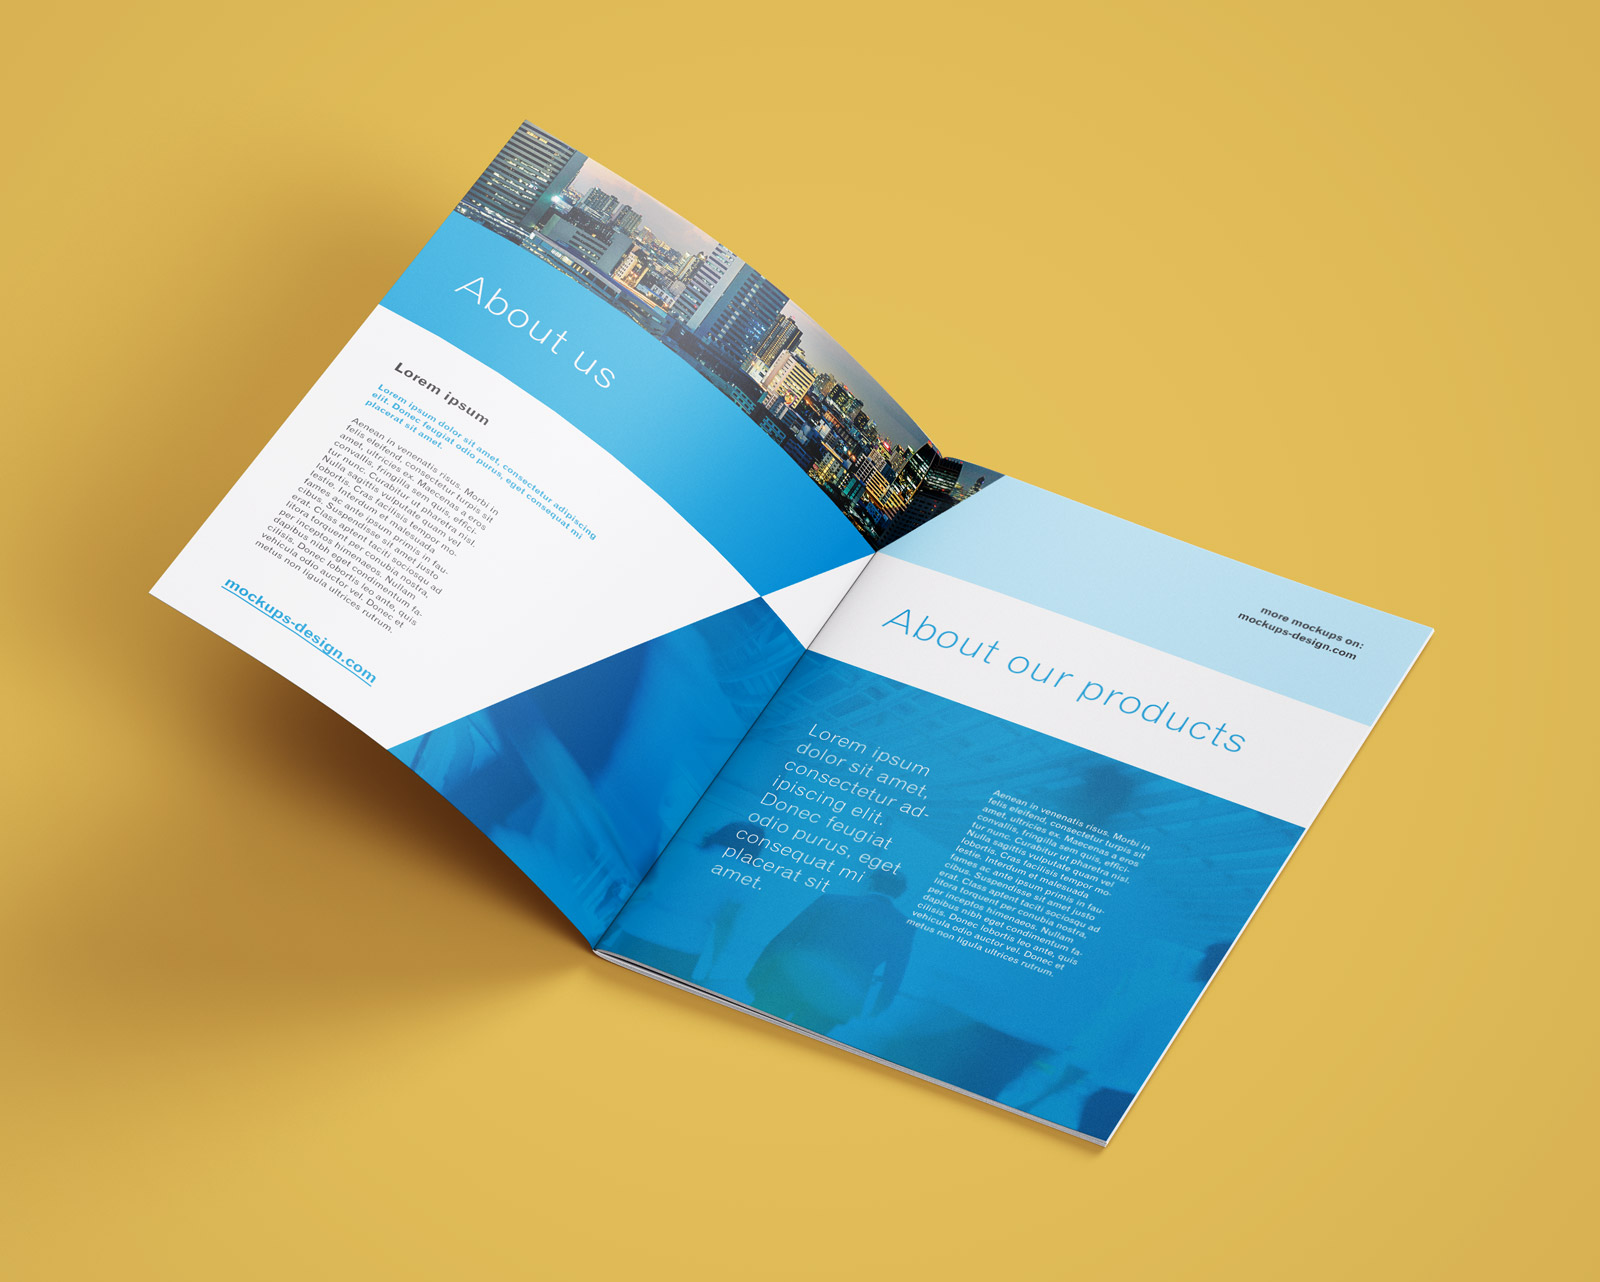 Free A4 Brochure Company Profile Mockup PSD (3)